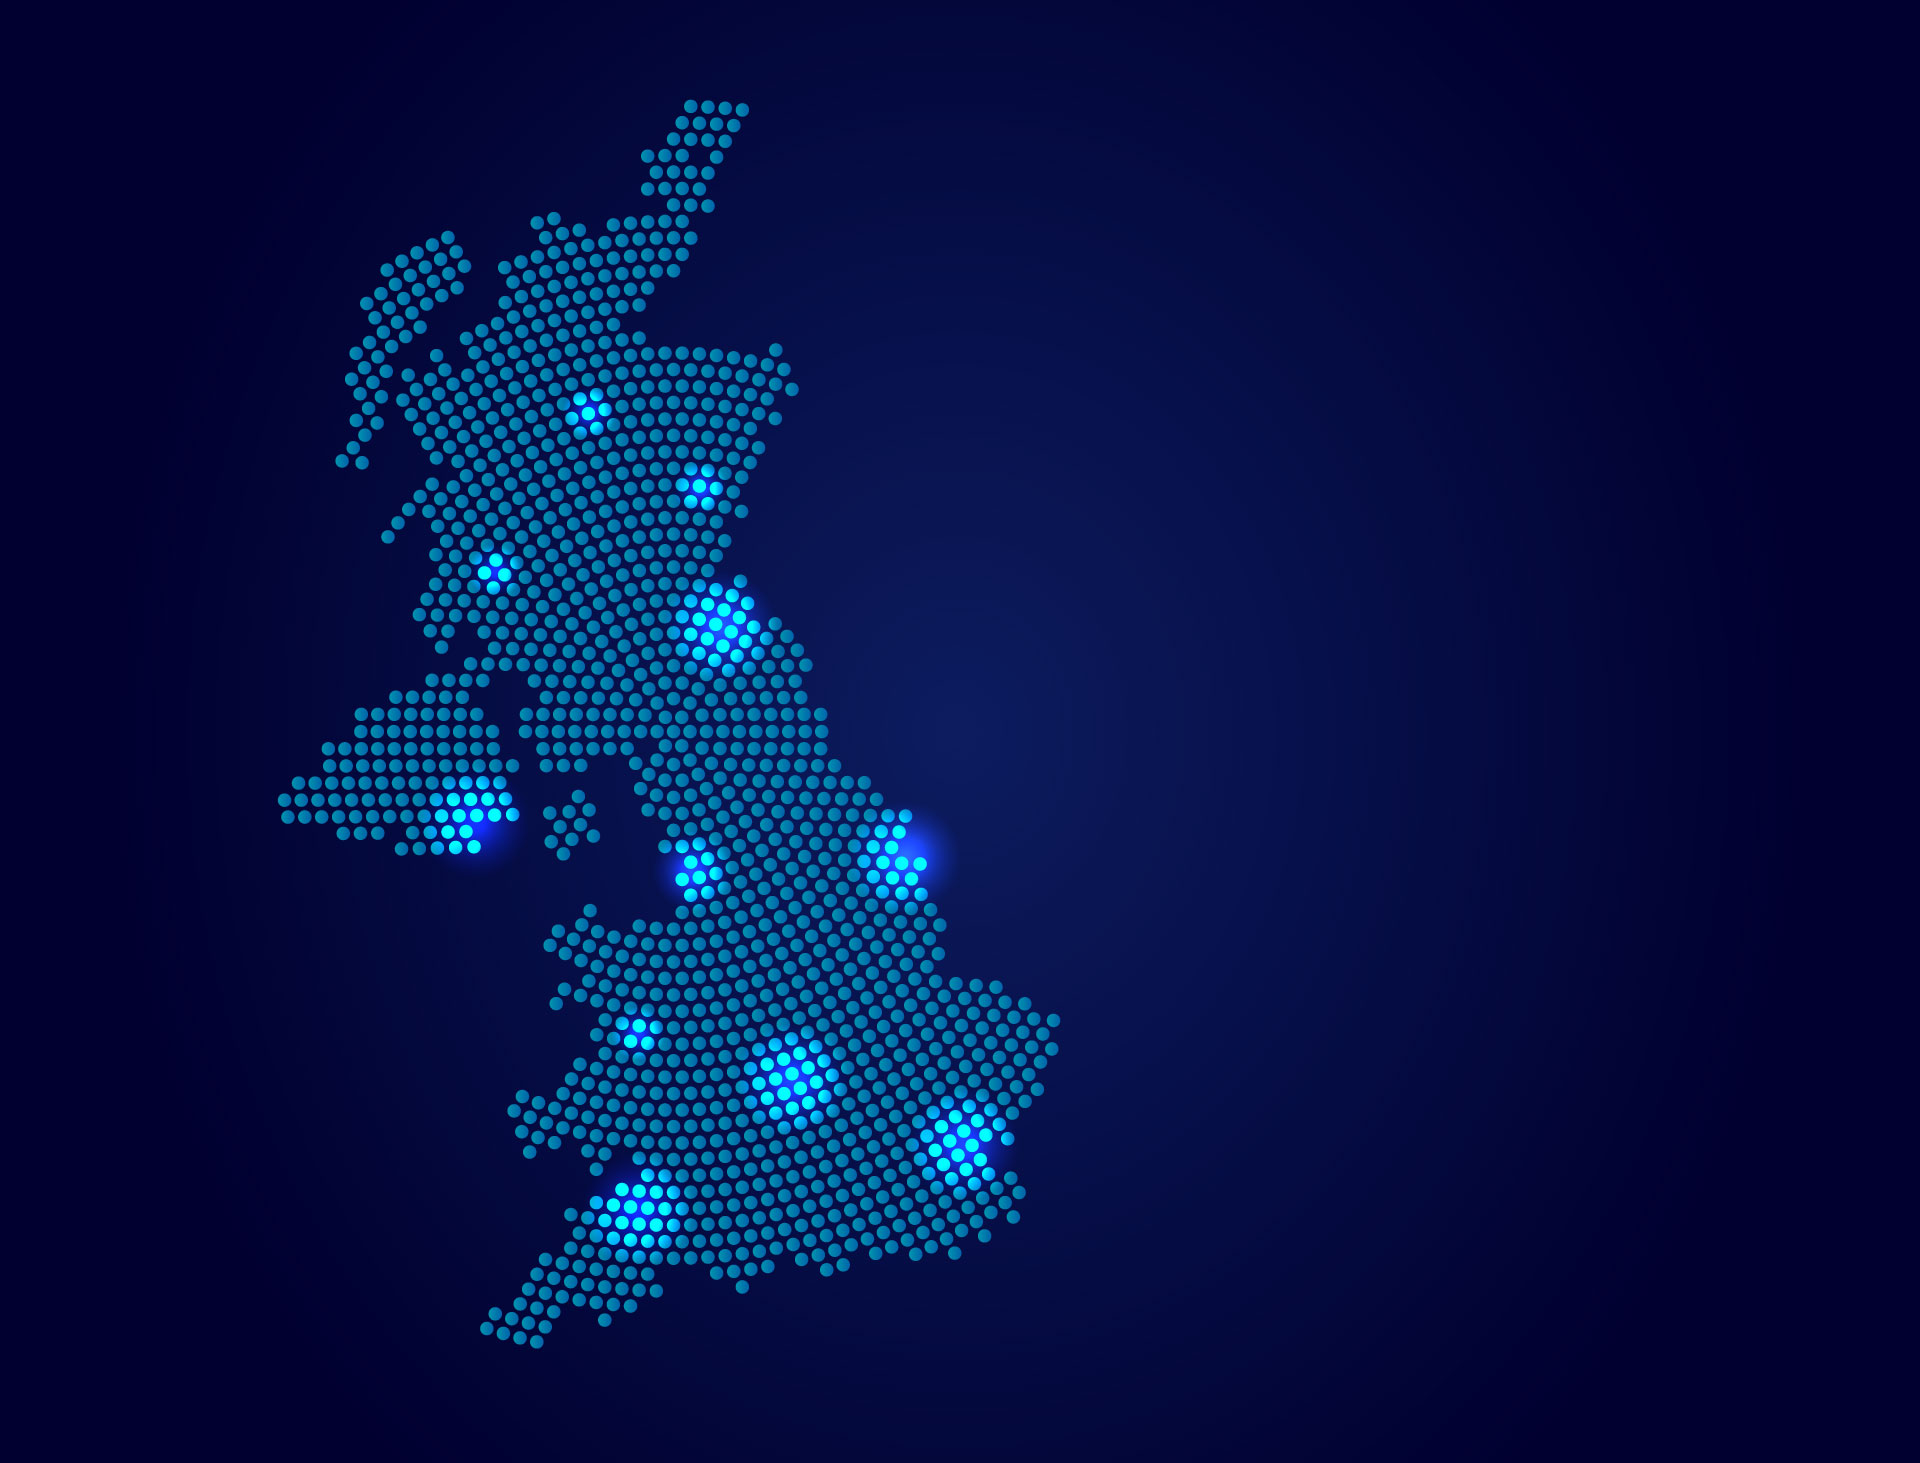 UK tech startups net £10bn in venture capital investments